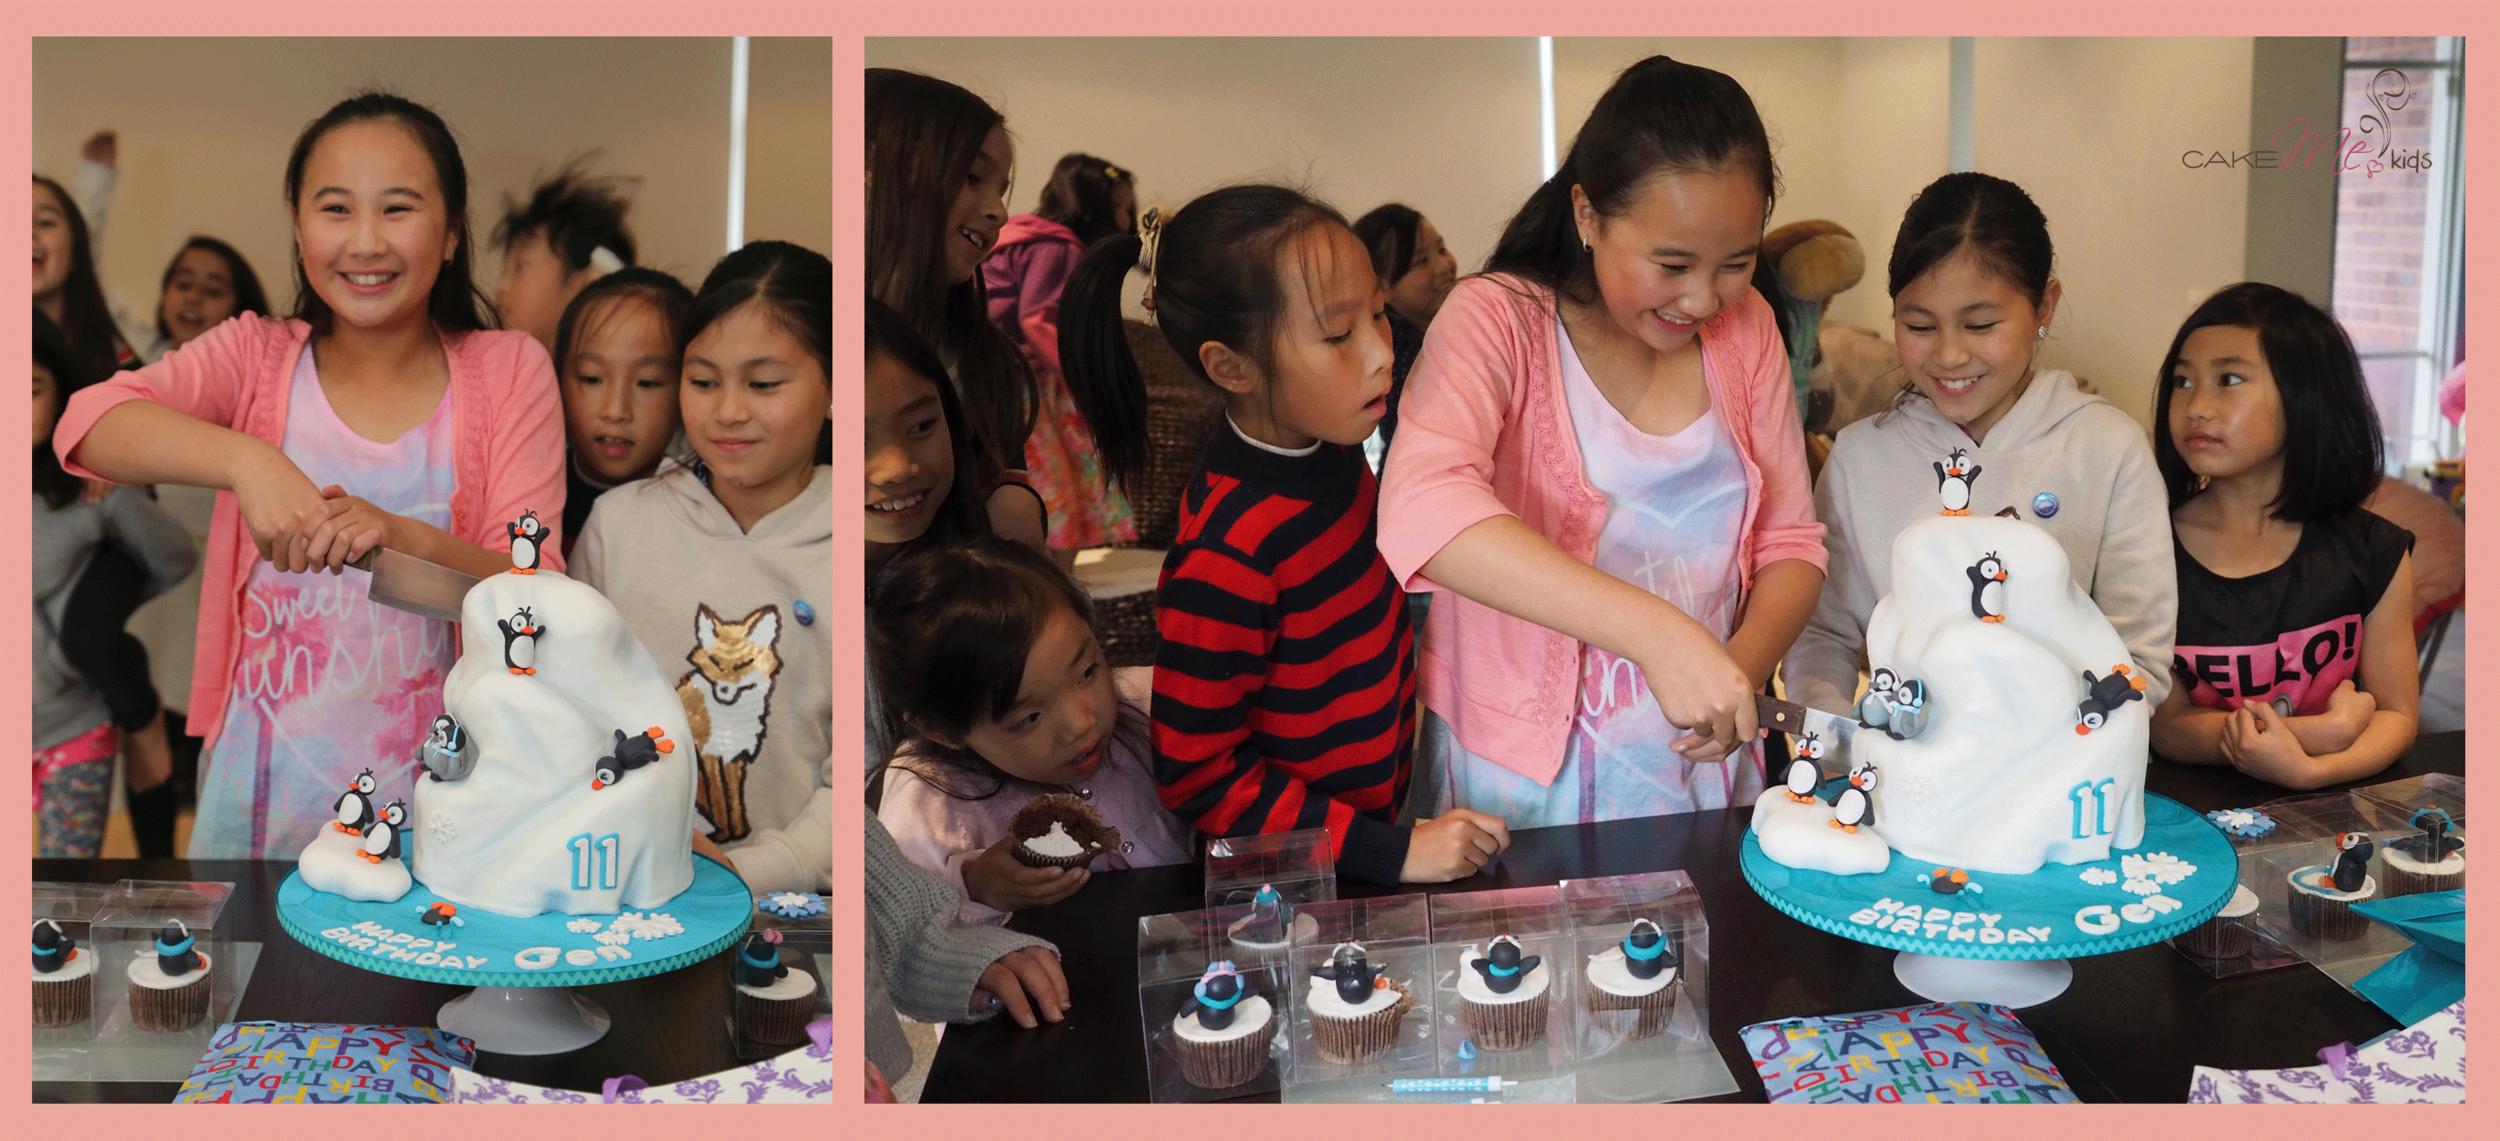 penguin iceberg cake me kids party